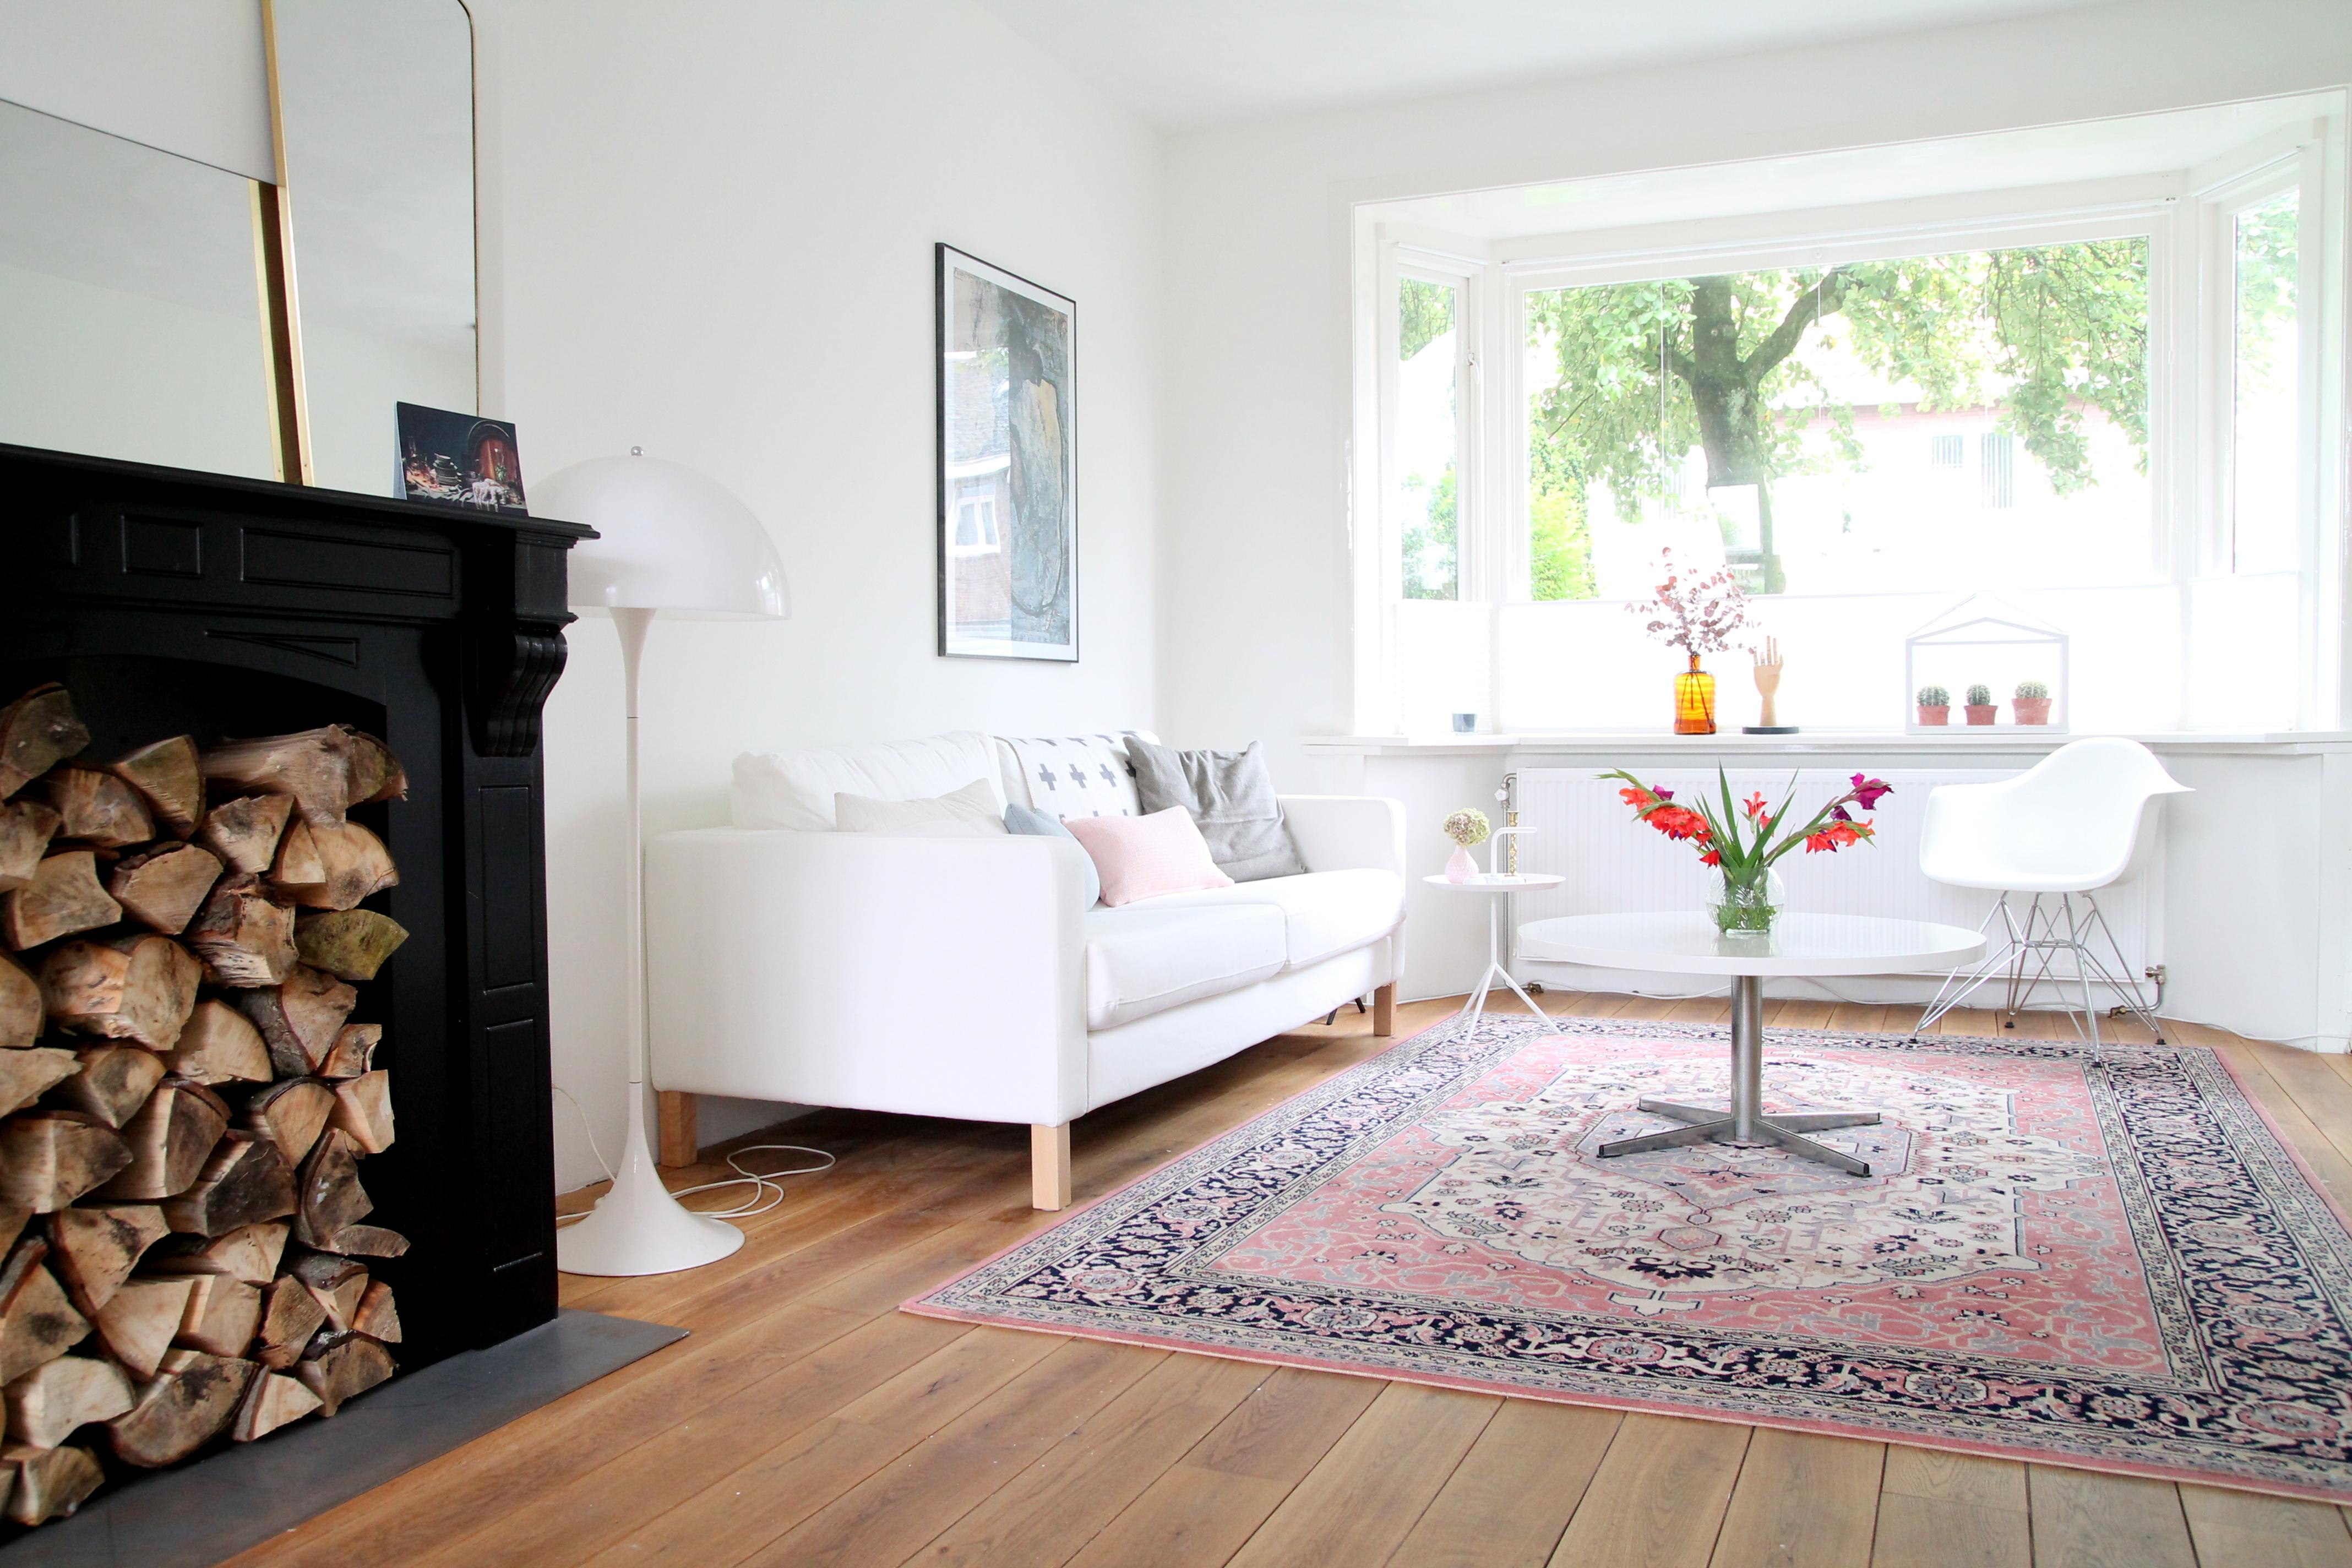 New Couch Ikea Karlstad Donebymyself